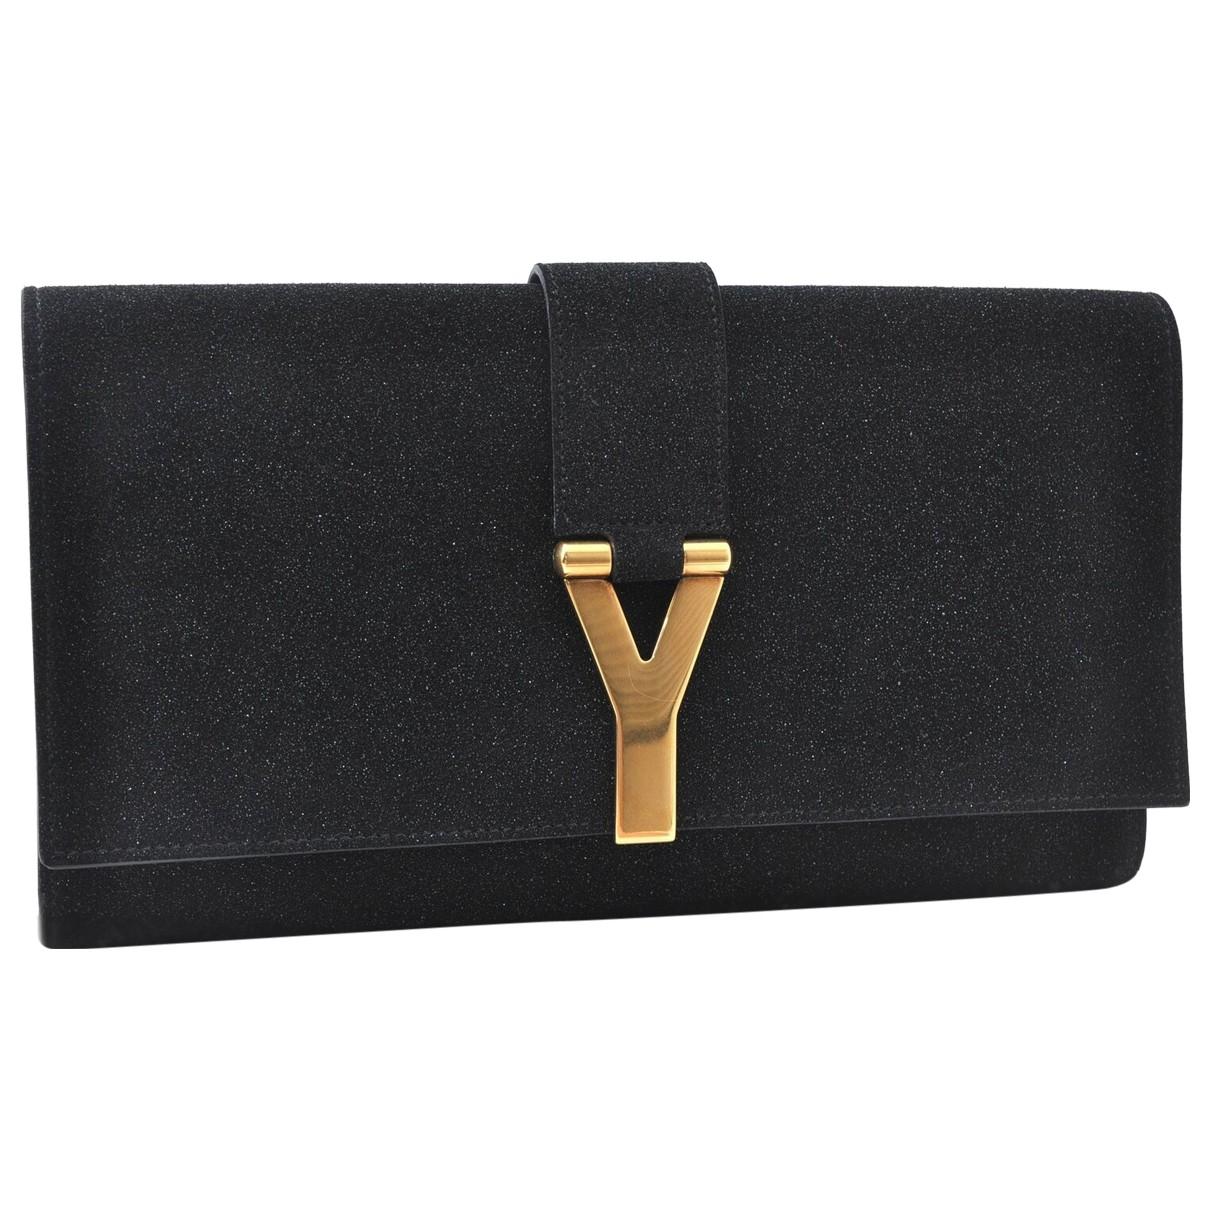 Yves Saint Laurent \N Clutch in  Schwarz Kunststoff